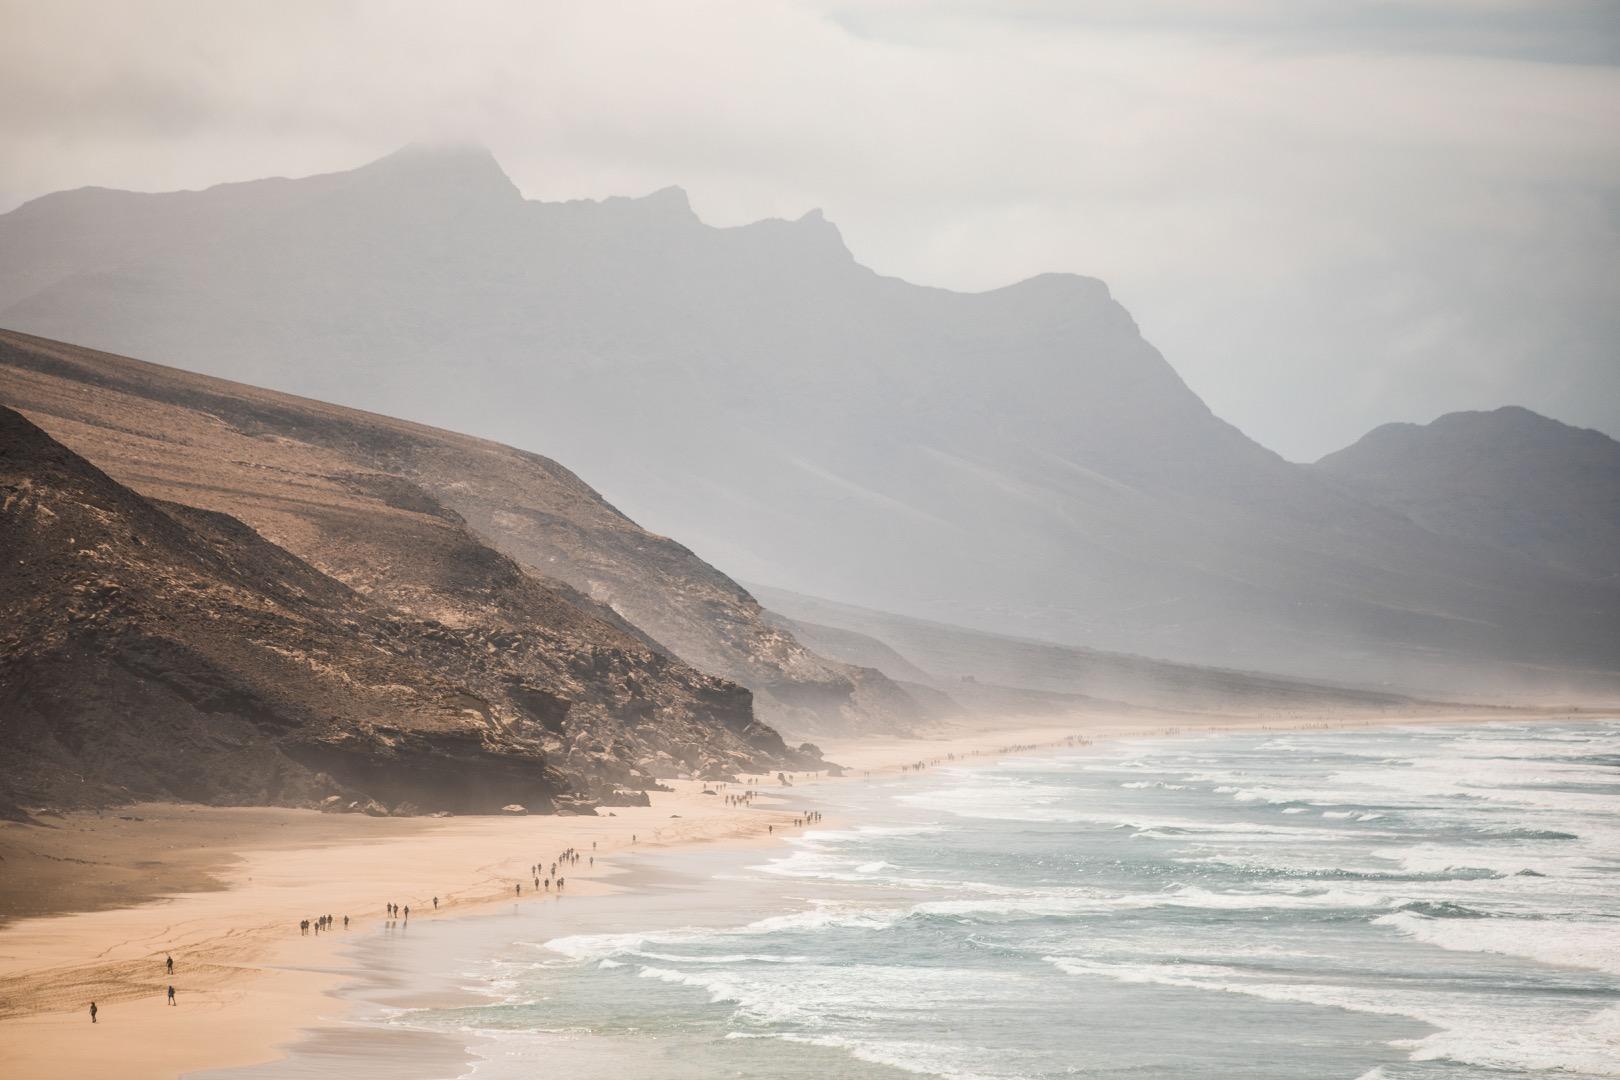 Crónica Etapa 1 Half Marathon des Sables Fuerteventura 2019